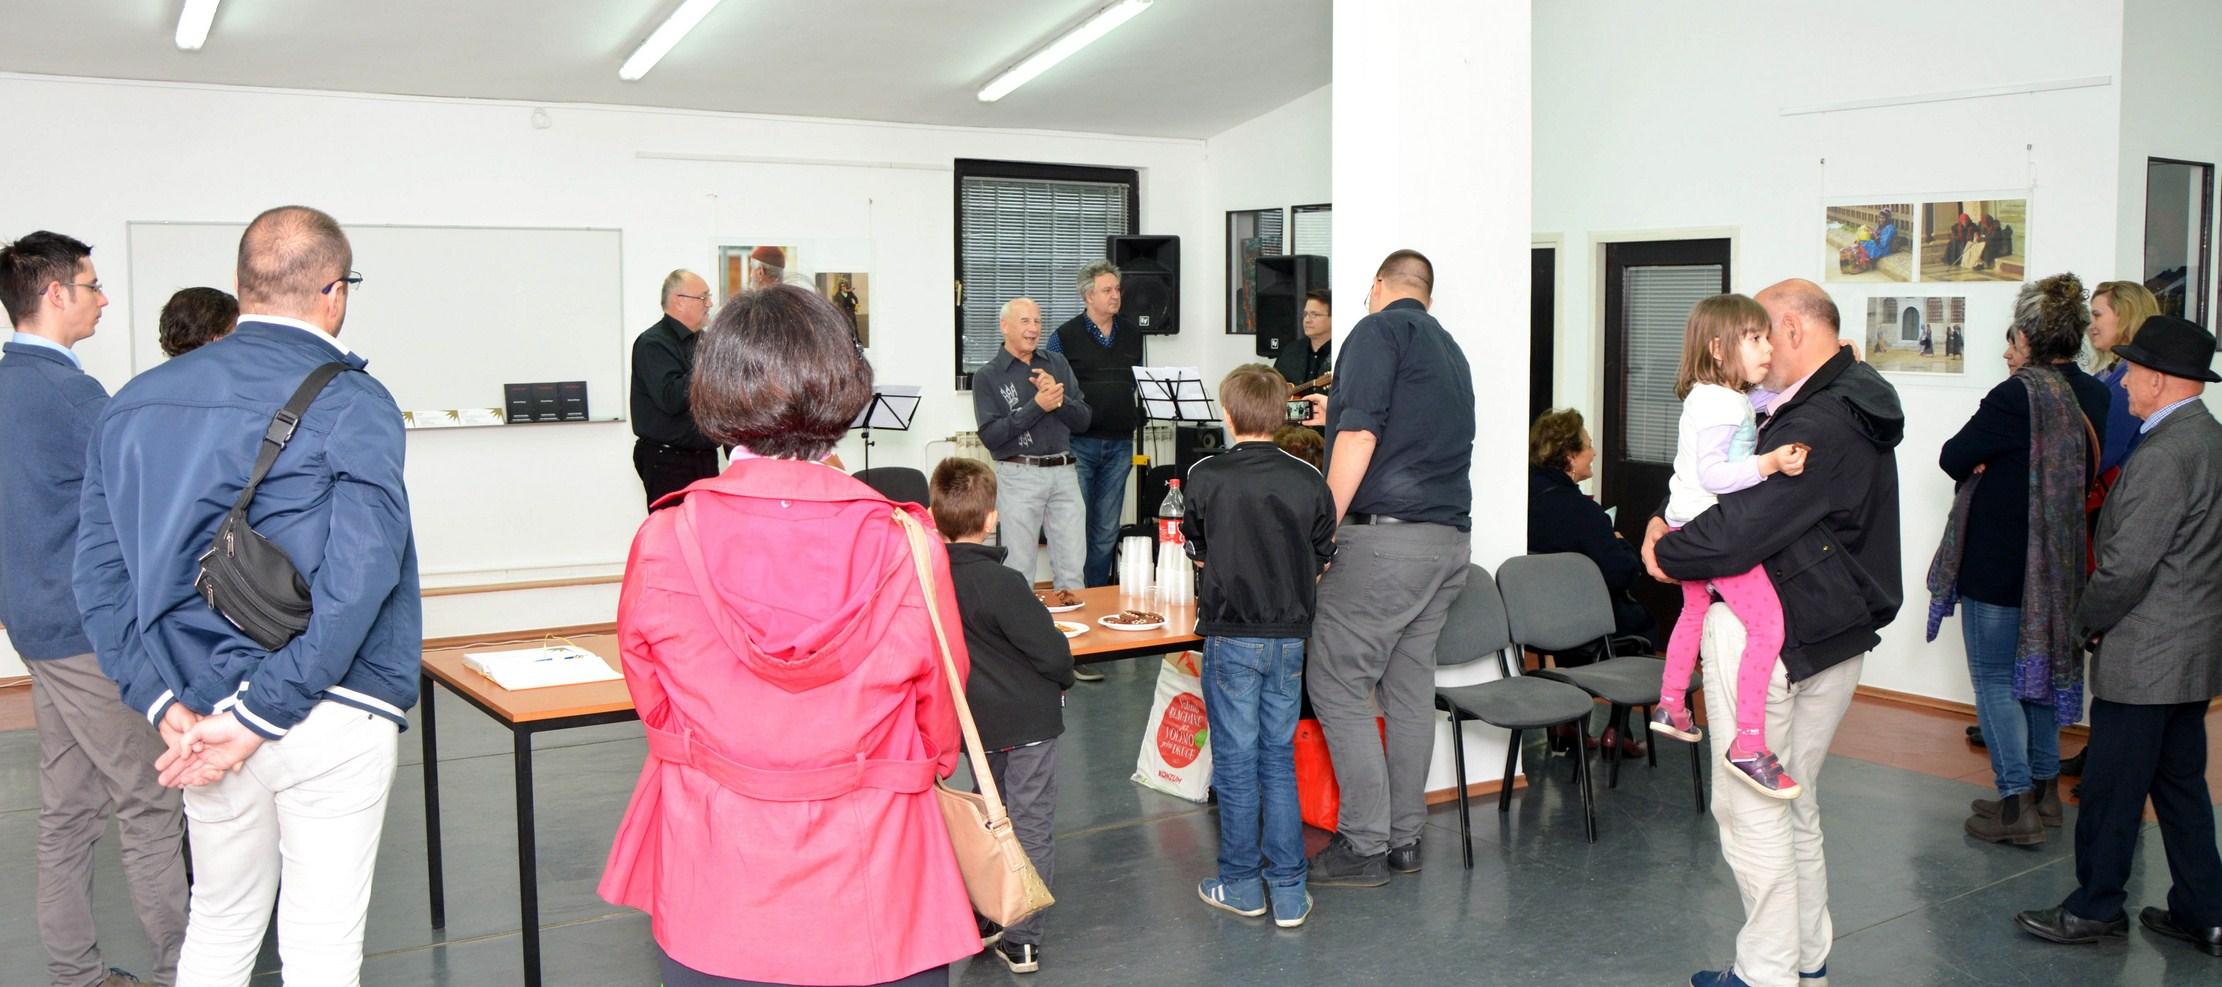 Michael Winger Galerija Sunce Zagreb 27 04 2017 7